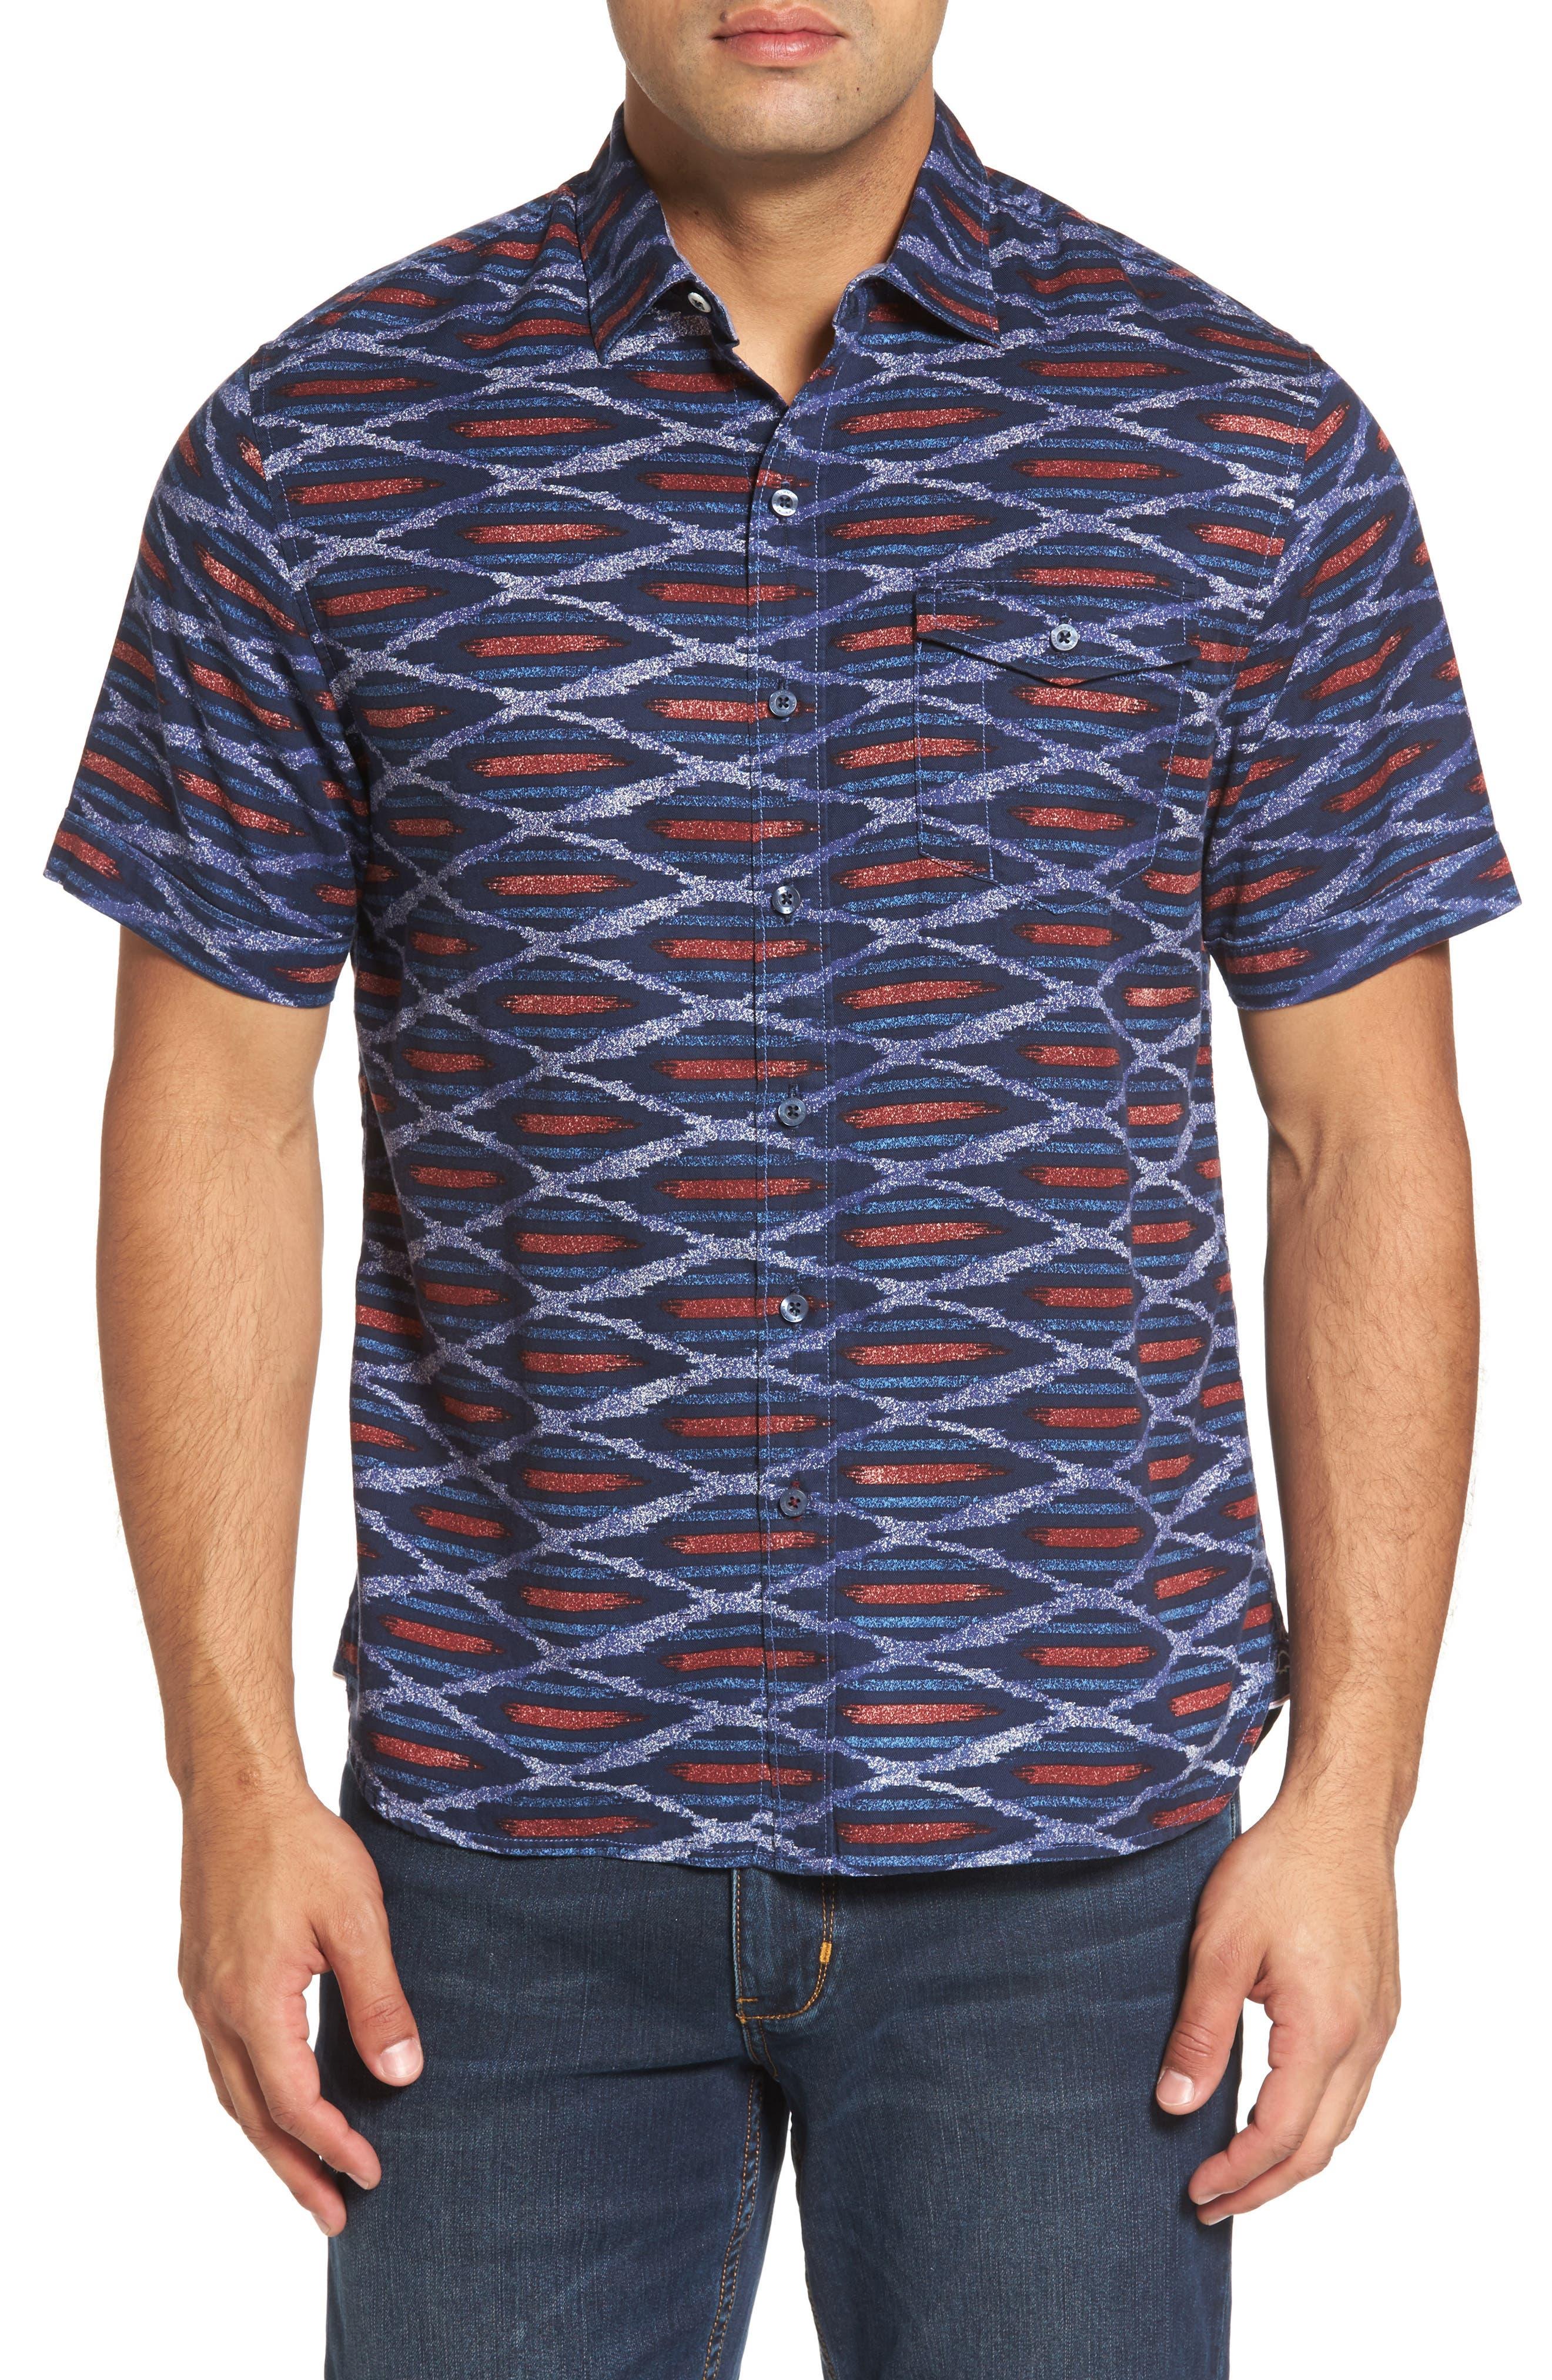 TOMMY BAHAMA Island Ikat Standard Fit Geo Print Woven Shirt